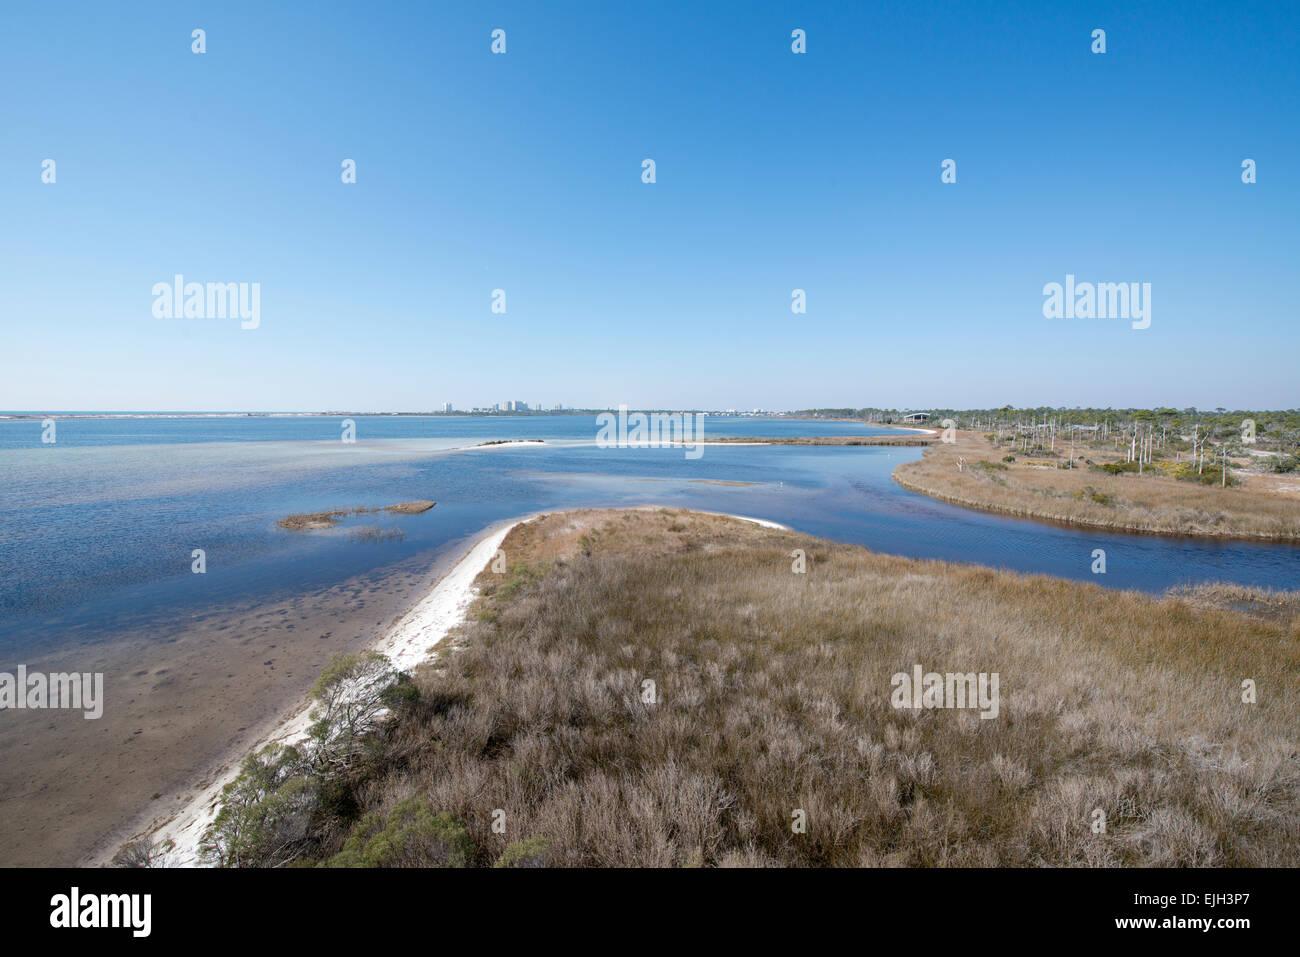 A view of Pensacola Bay at Big Lagoon State Park in Pensacola, Florida Stock Photo